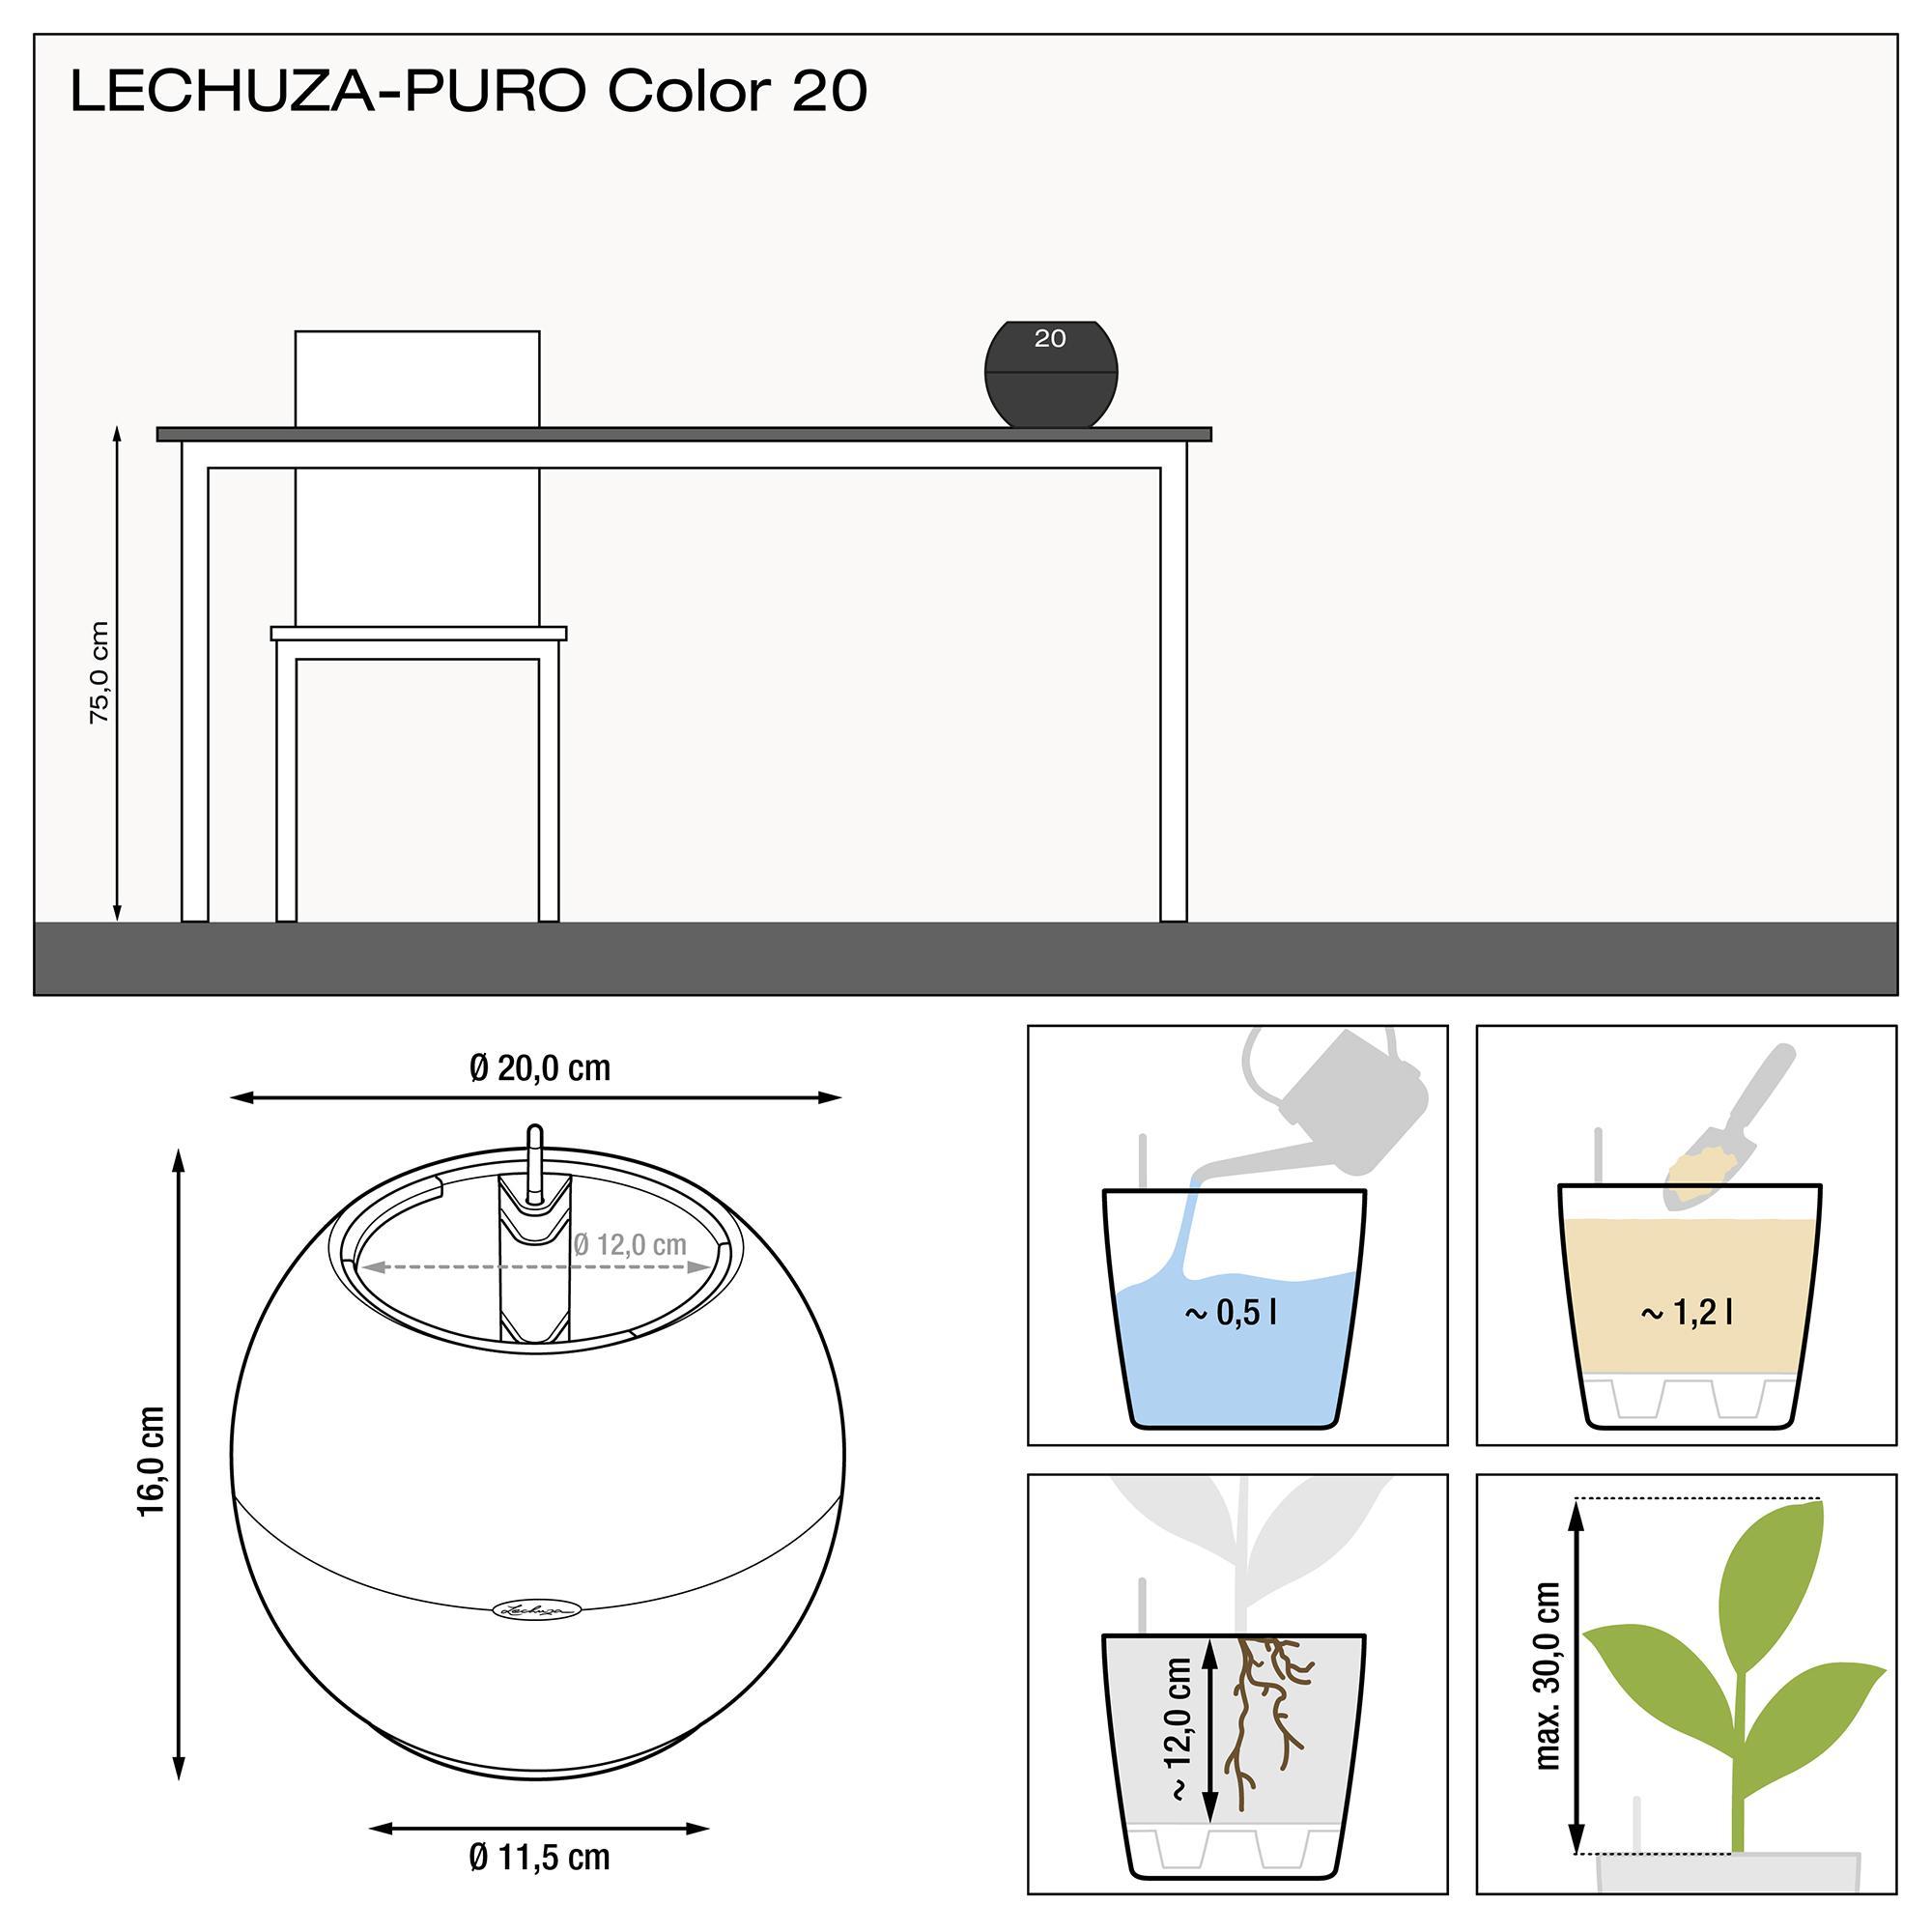 LECHUZA-PURO Color 20 lime green - Image 3